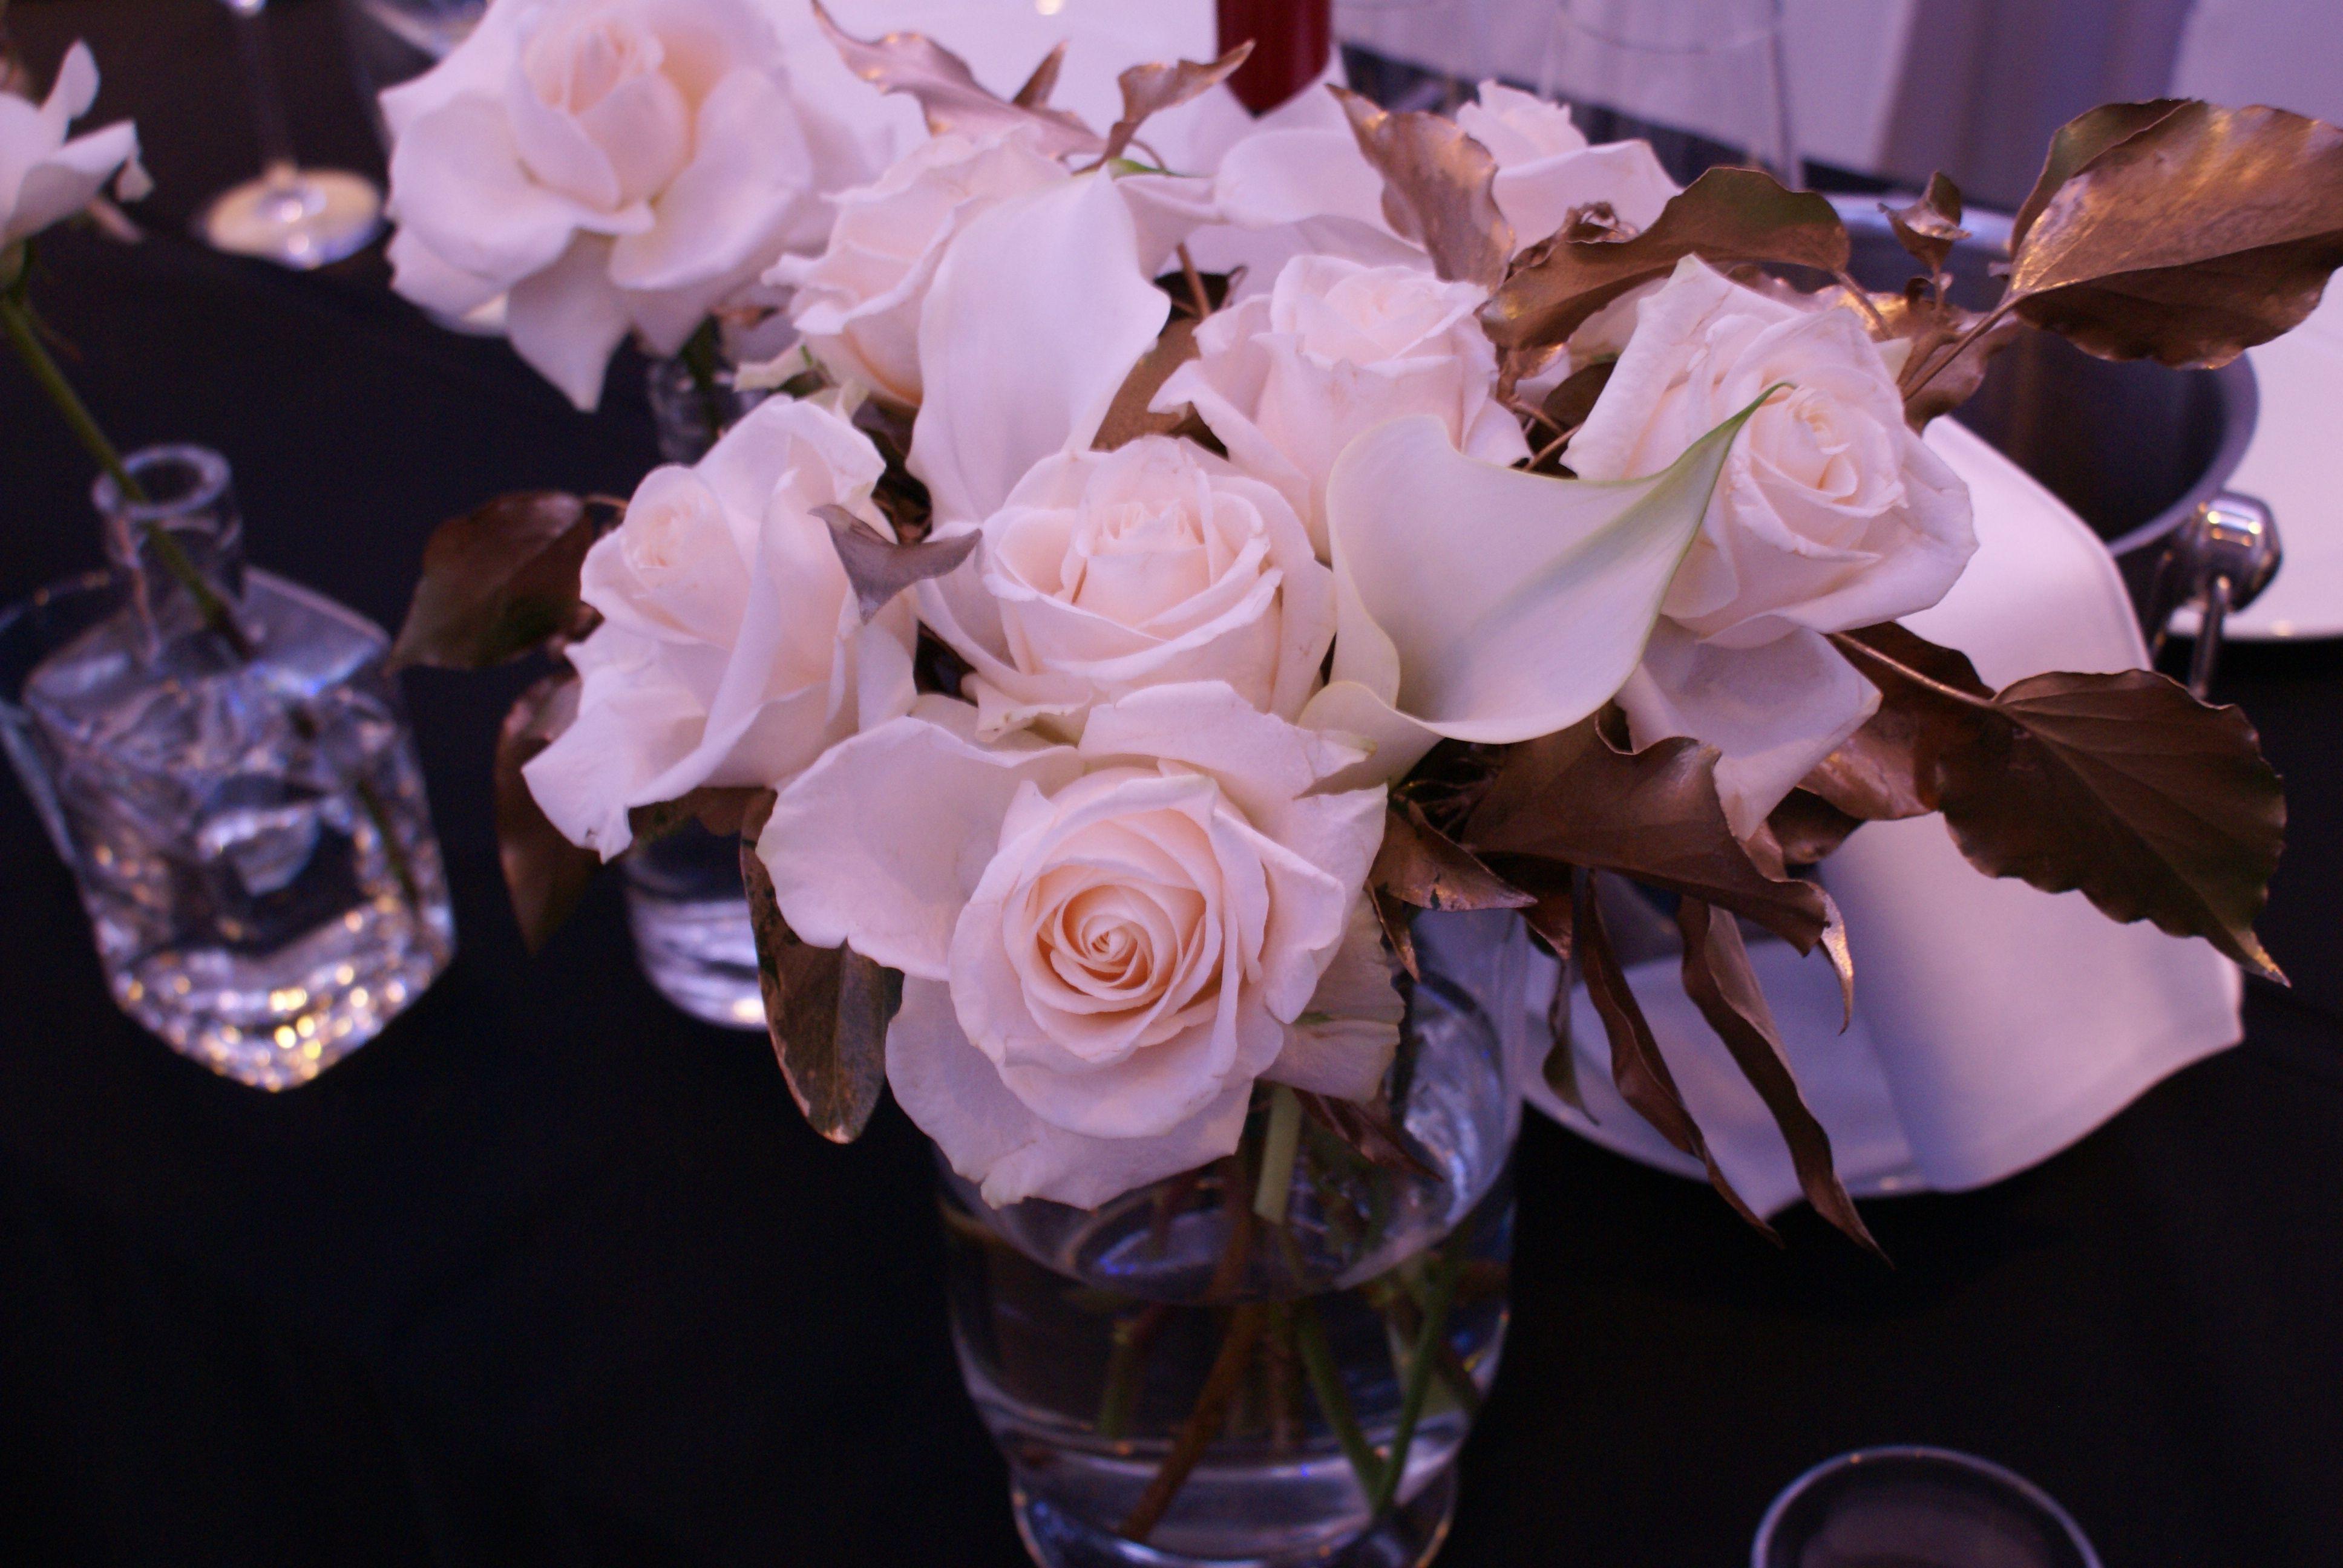 New Year S Eve Themed Wedding Sweet Hearts Table Novogodisnje Vjencanje Stol Mladenaca Bloom Flower Boxes Flowers